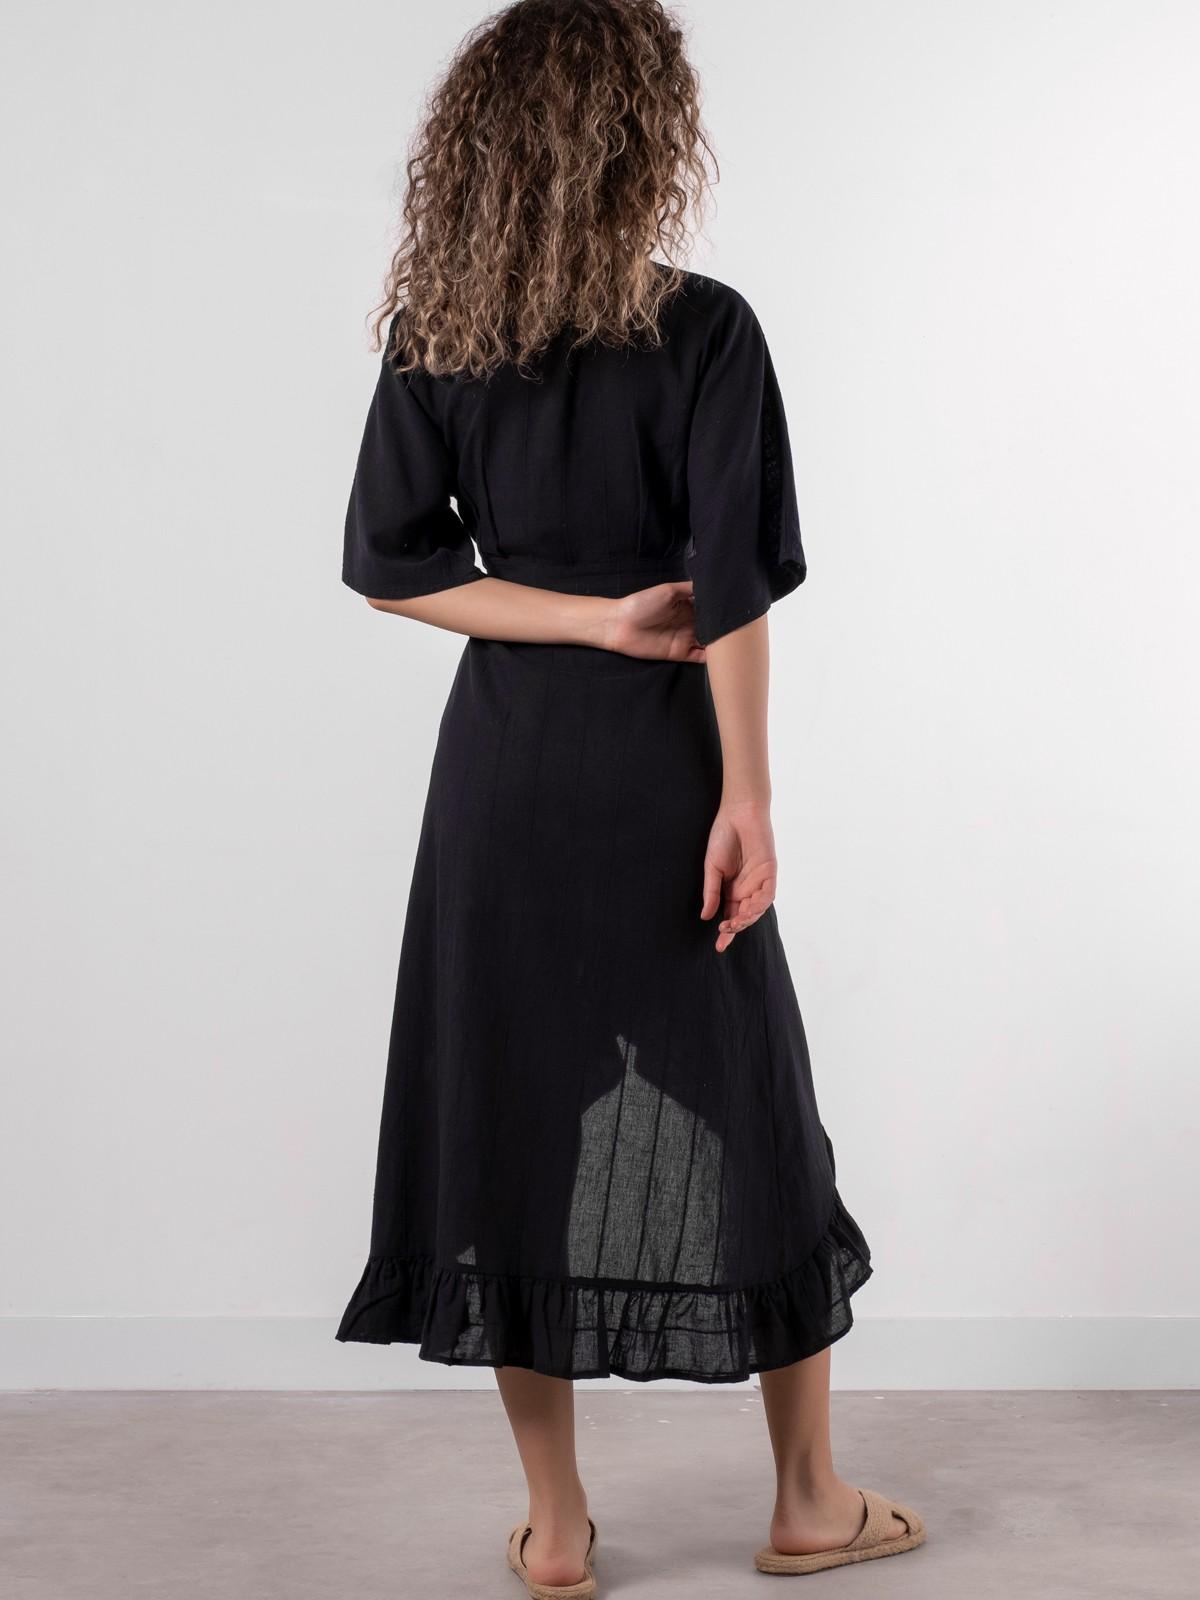 frilled-dress-siyah3-1200x1600w